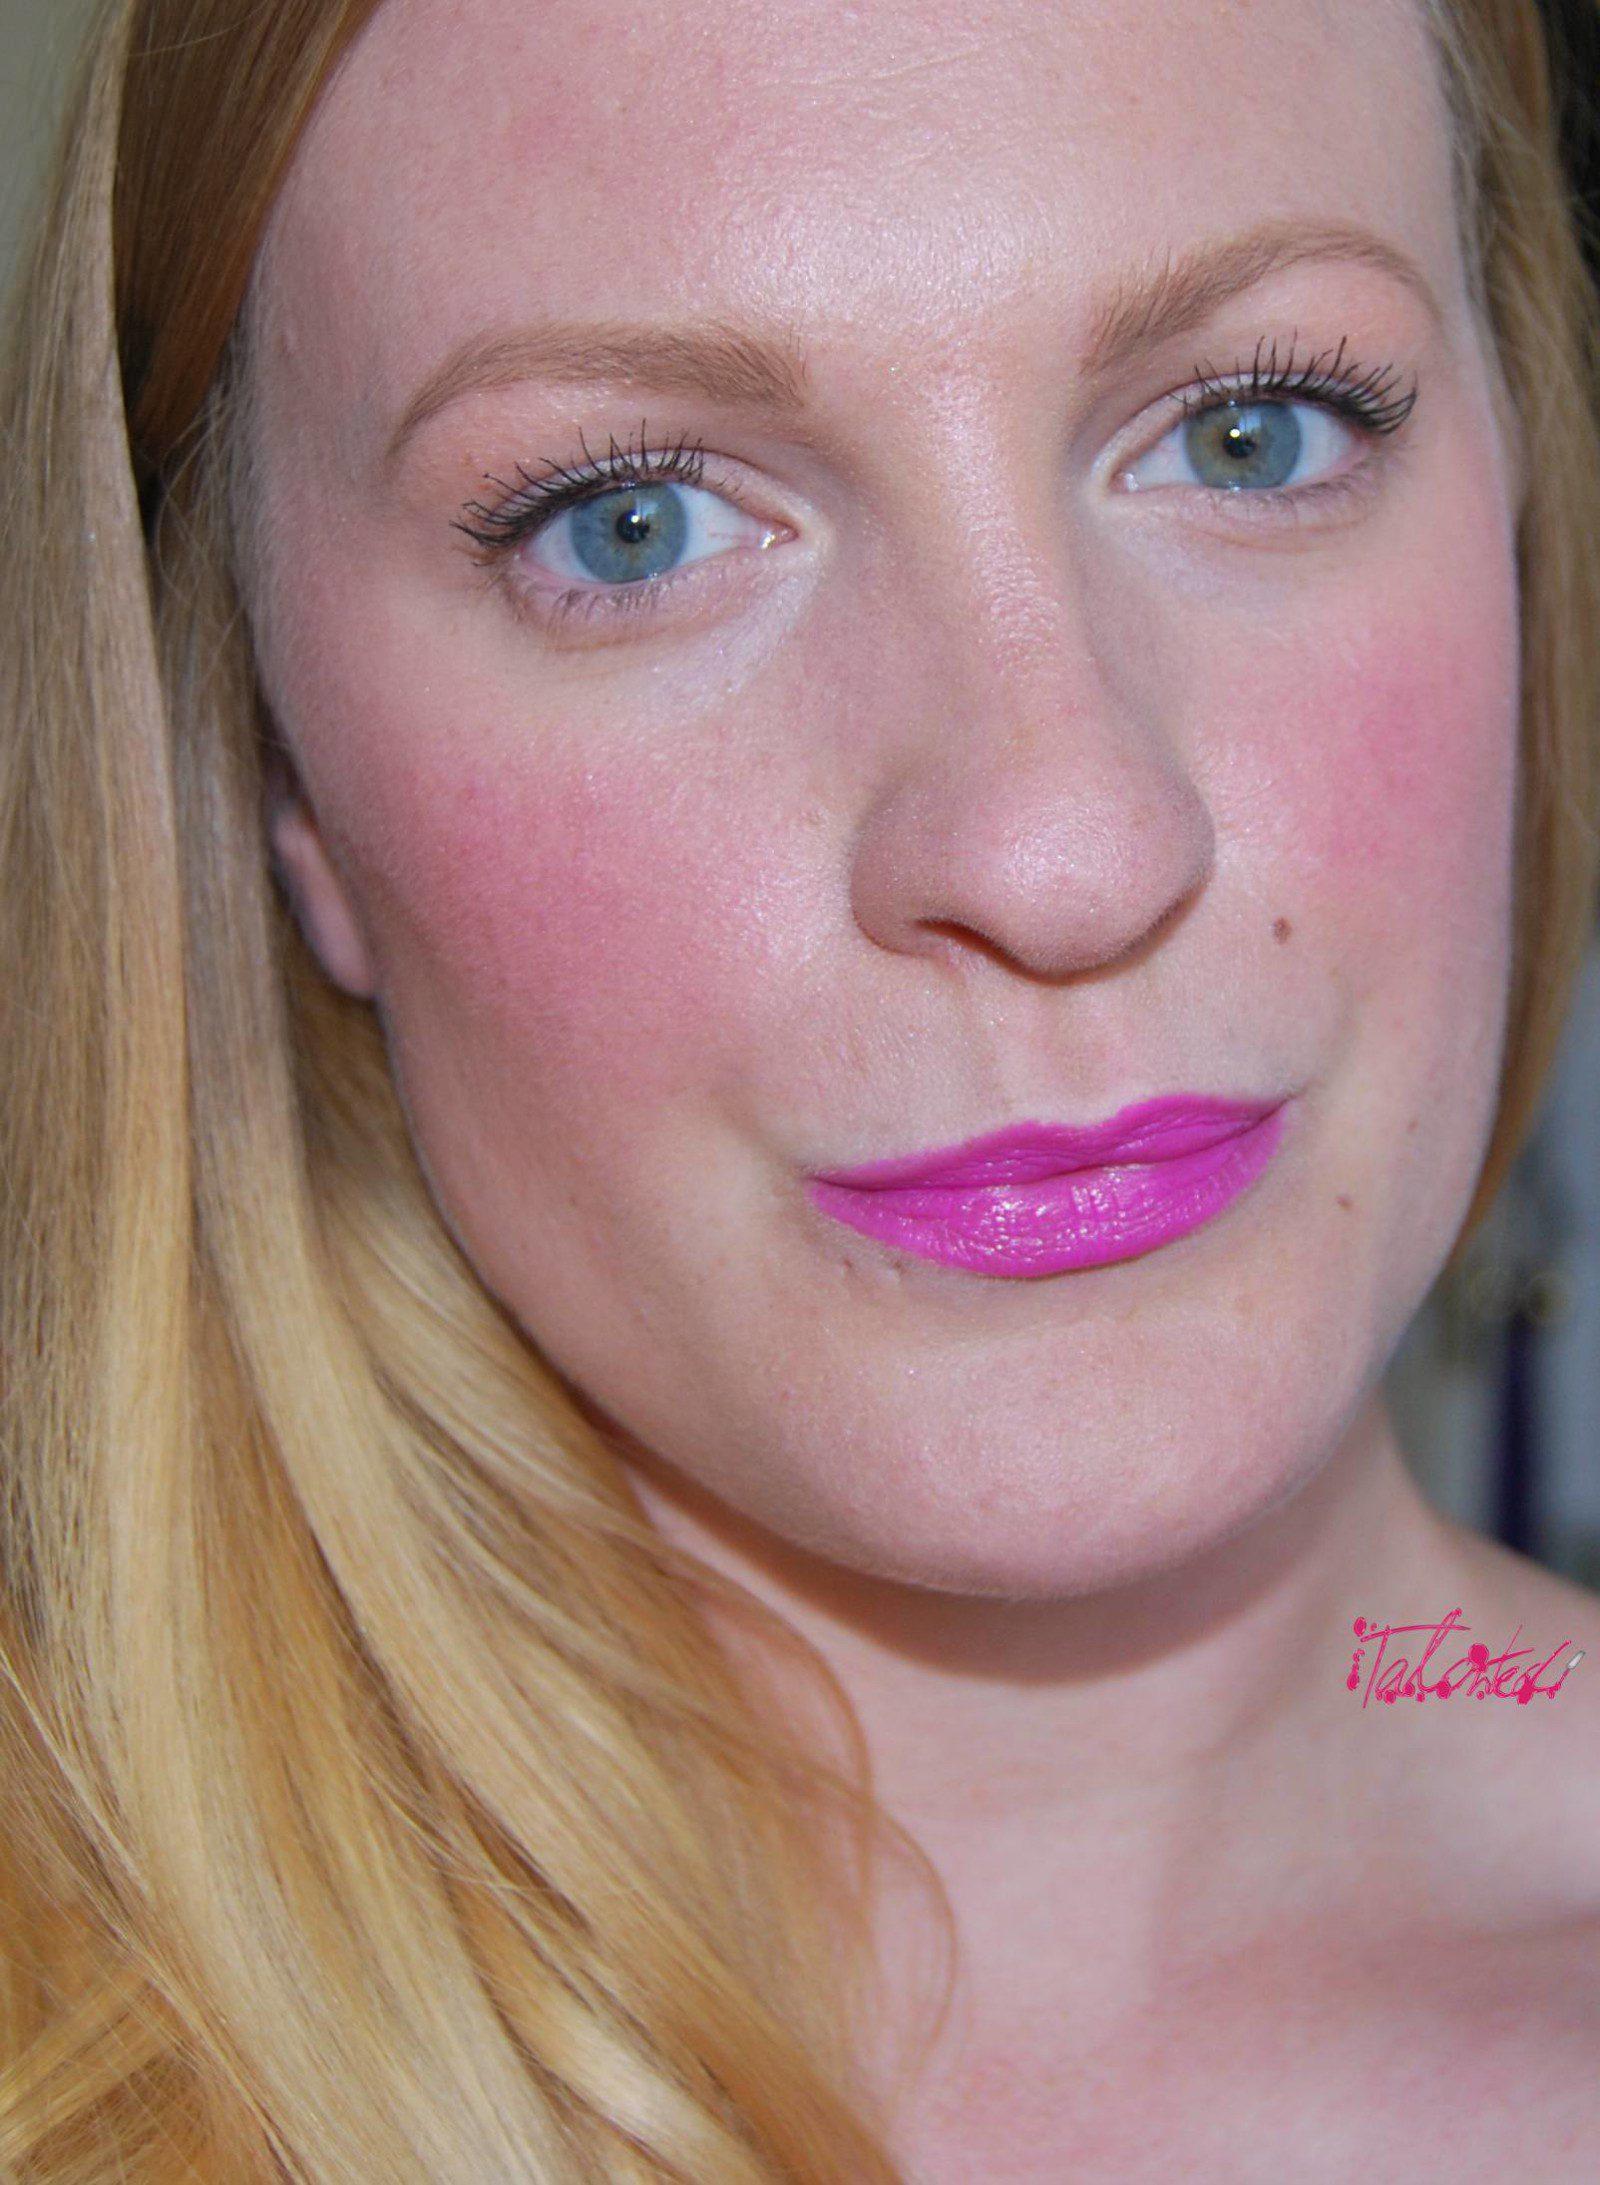 Claires Accessories lipstick Baby Pink